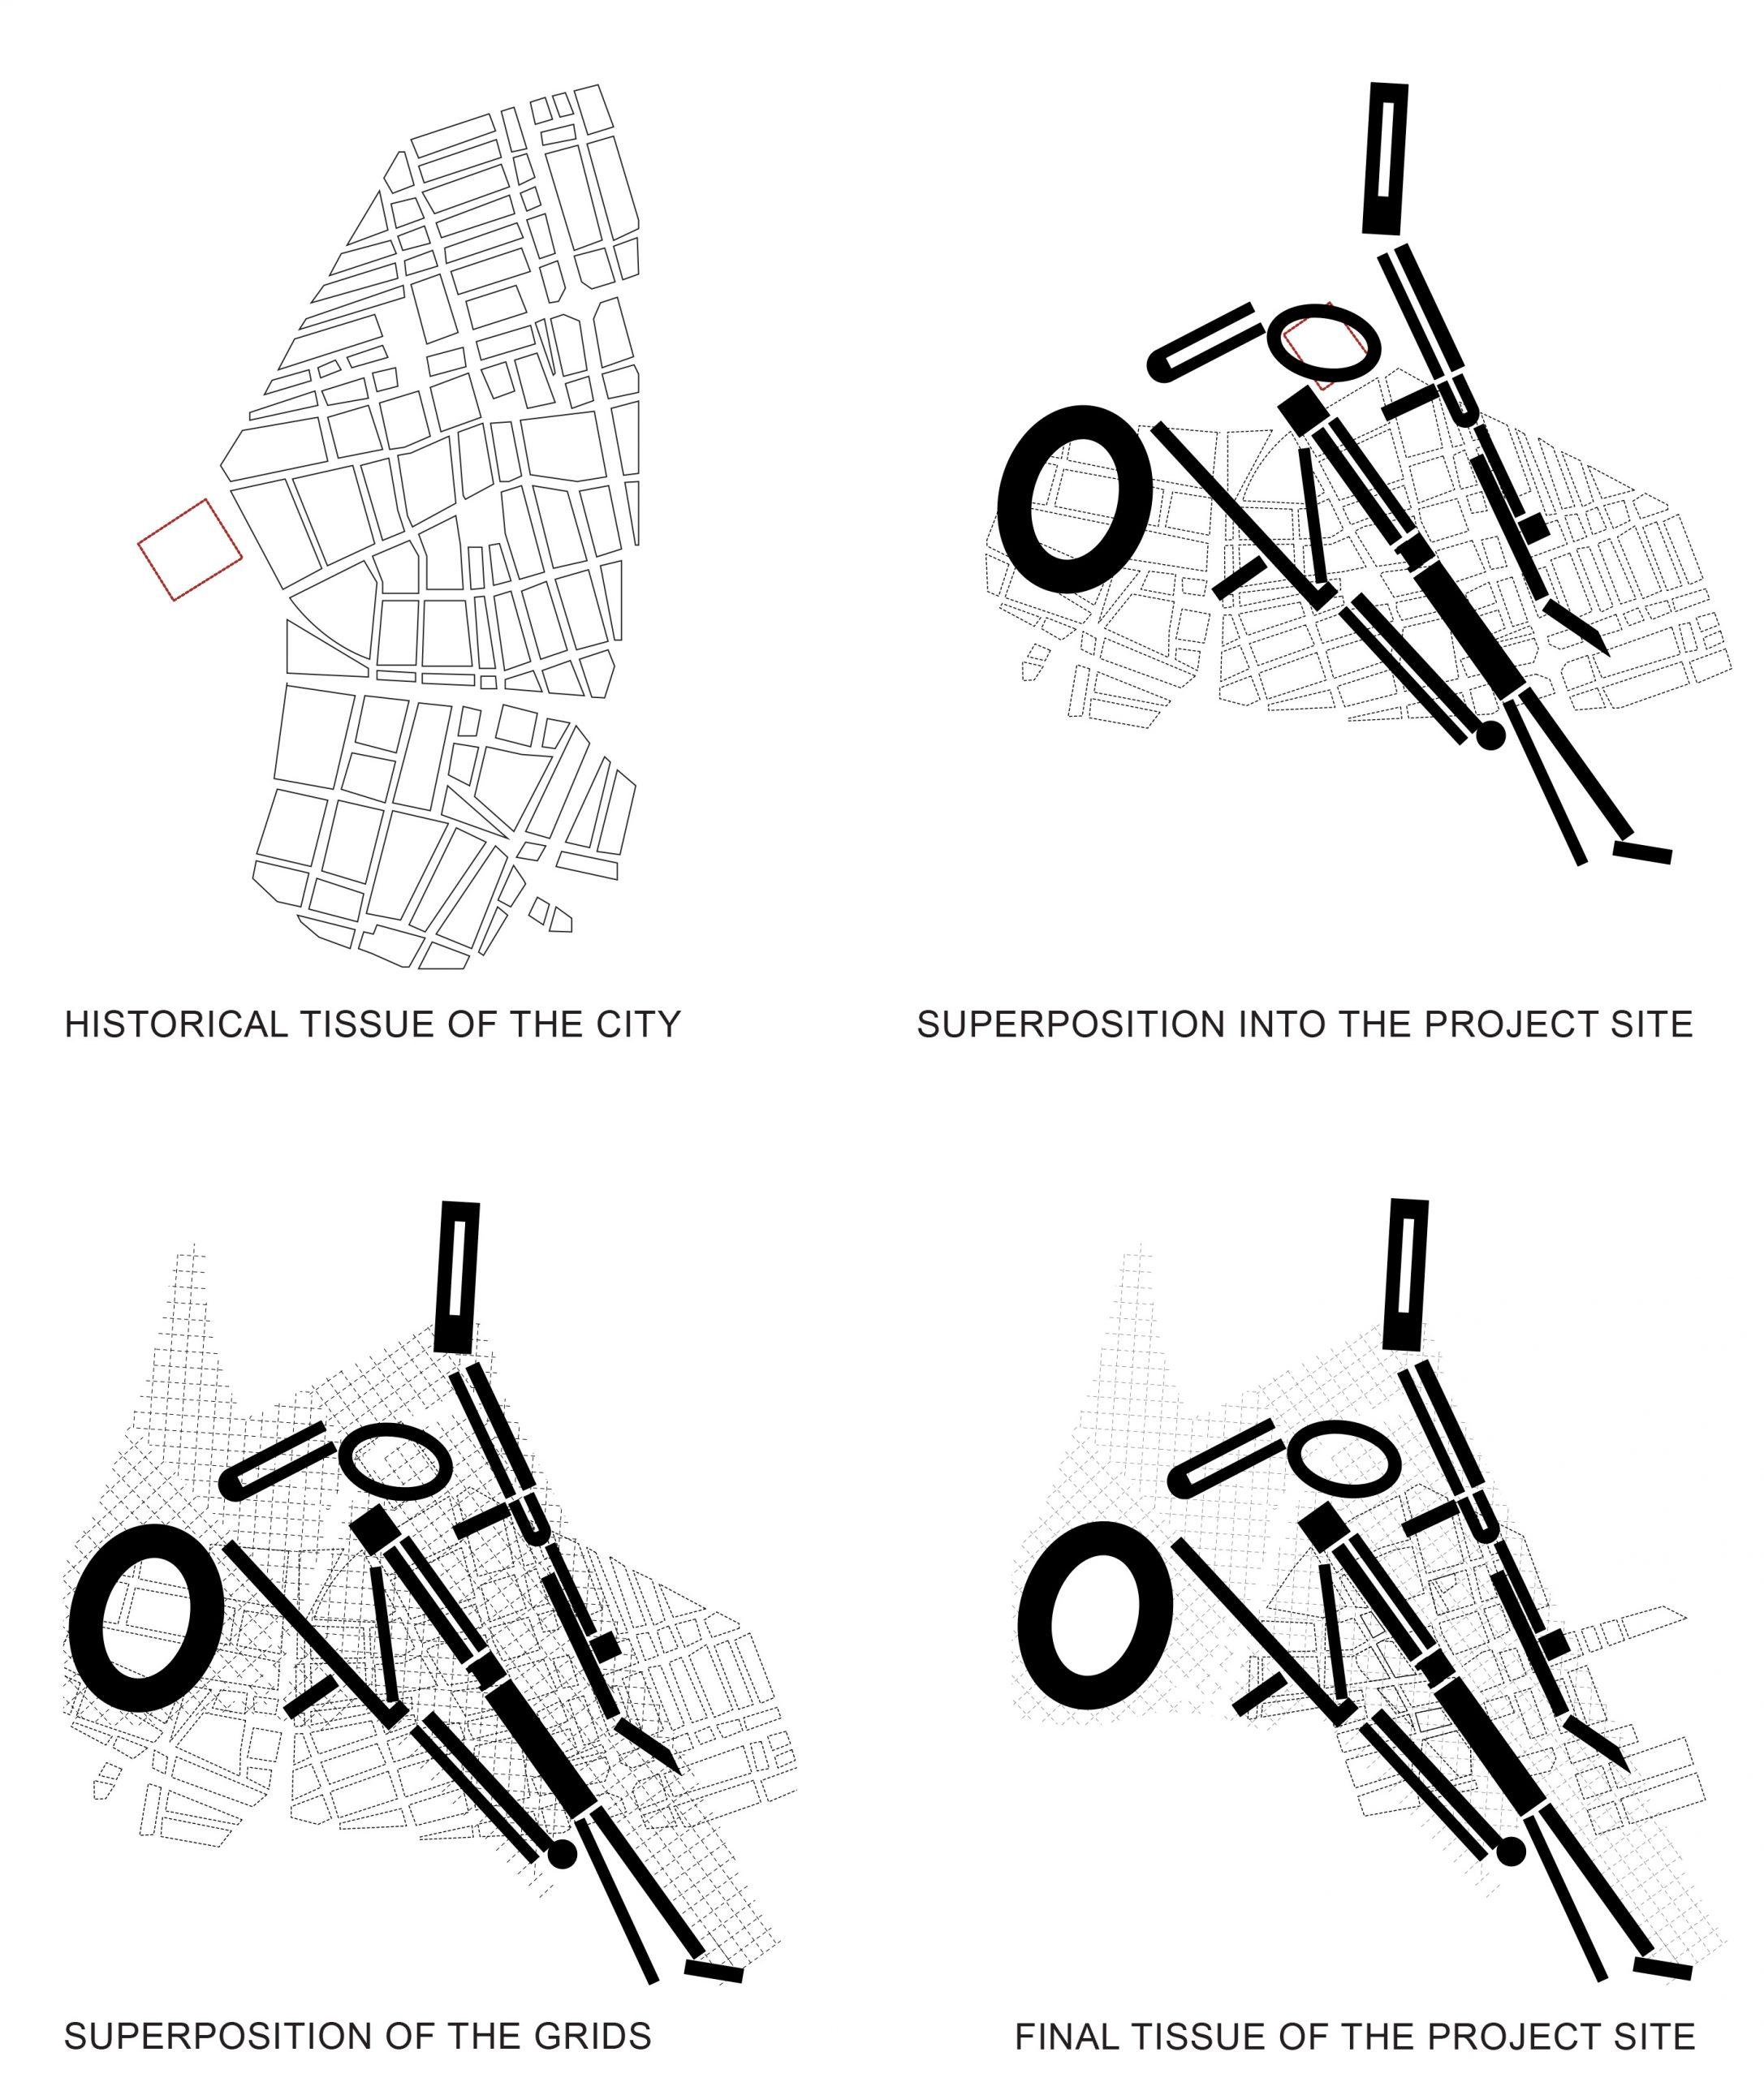 Degli-Esposti-Architetti_Budapest-South-Gate_06